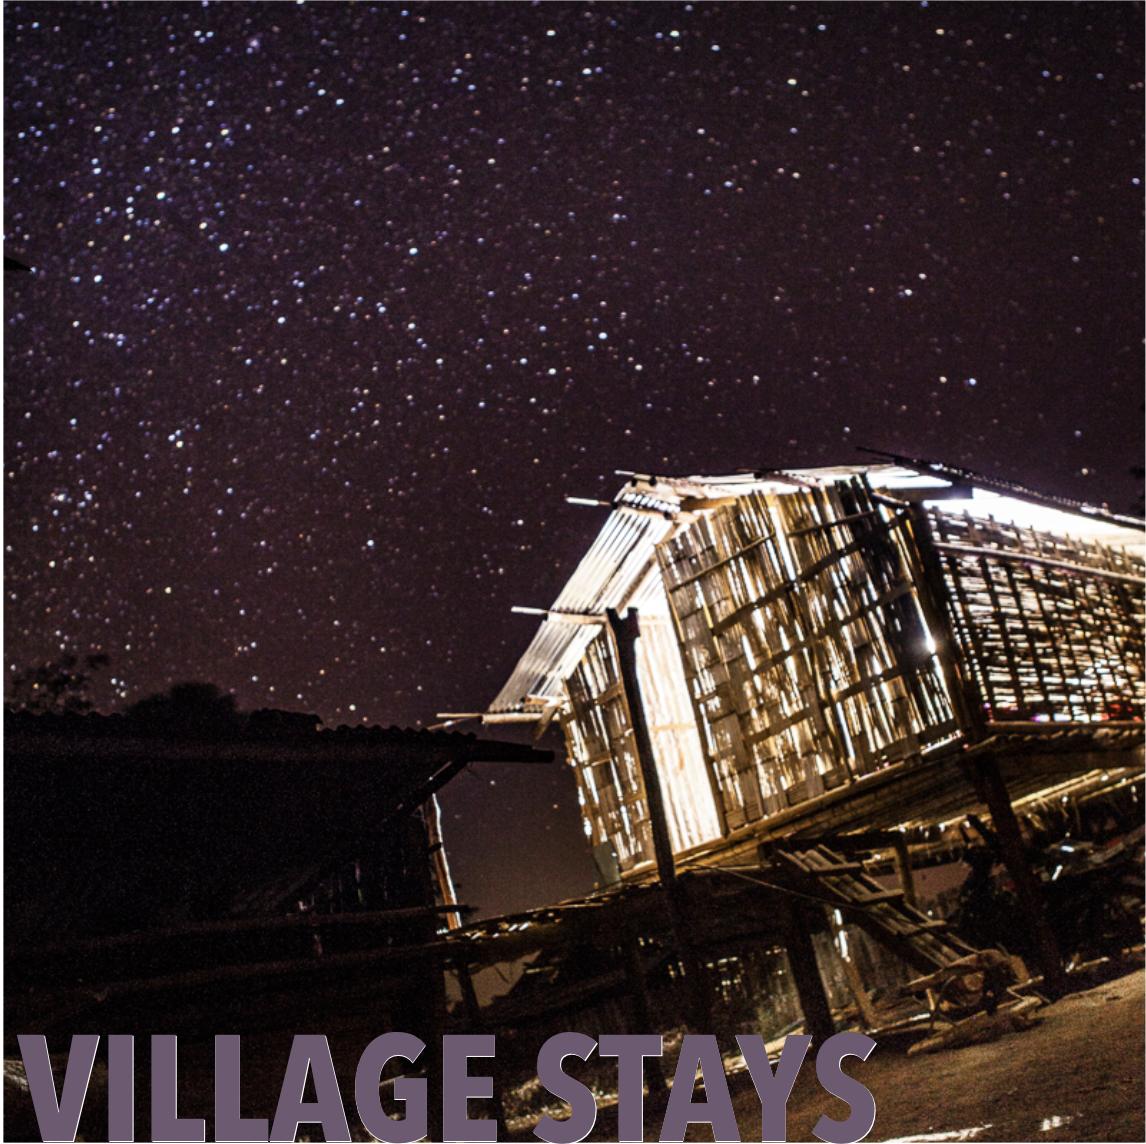 Village Stays.png